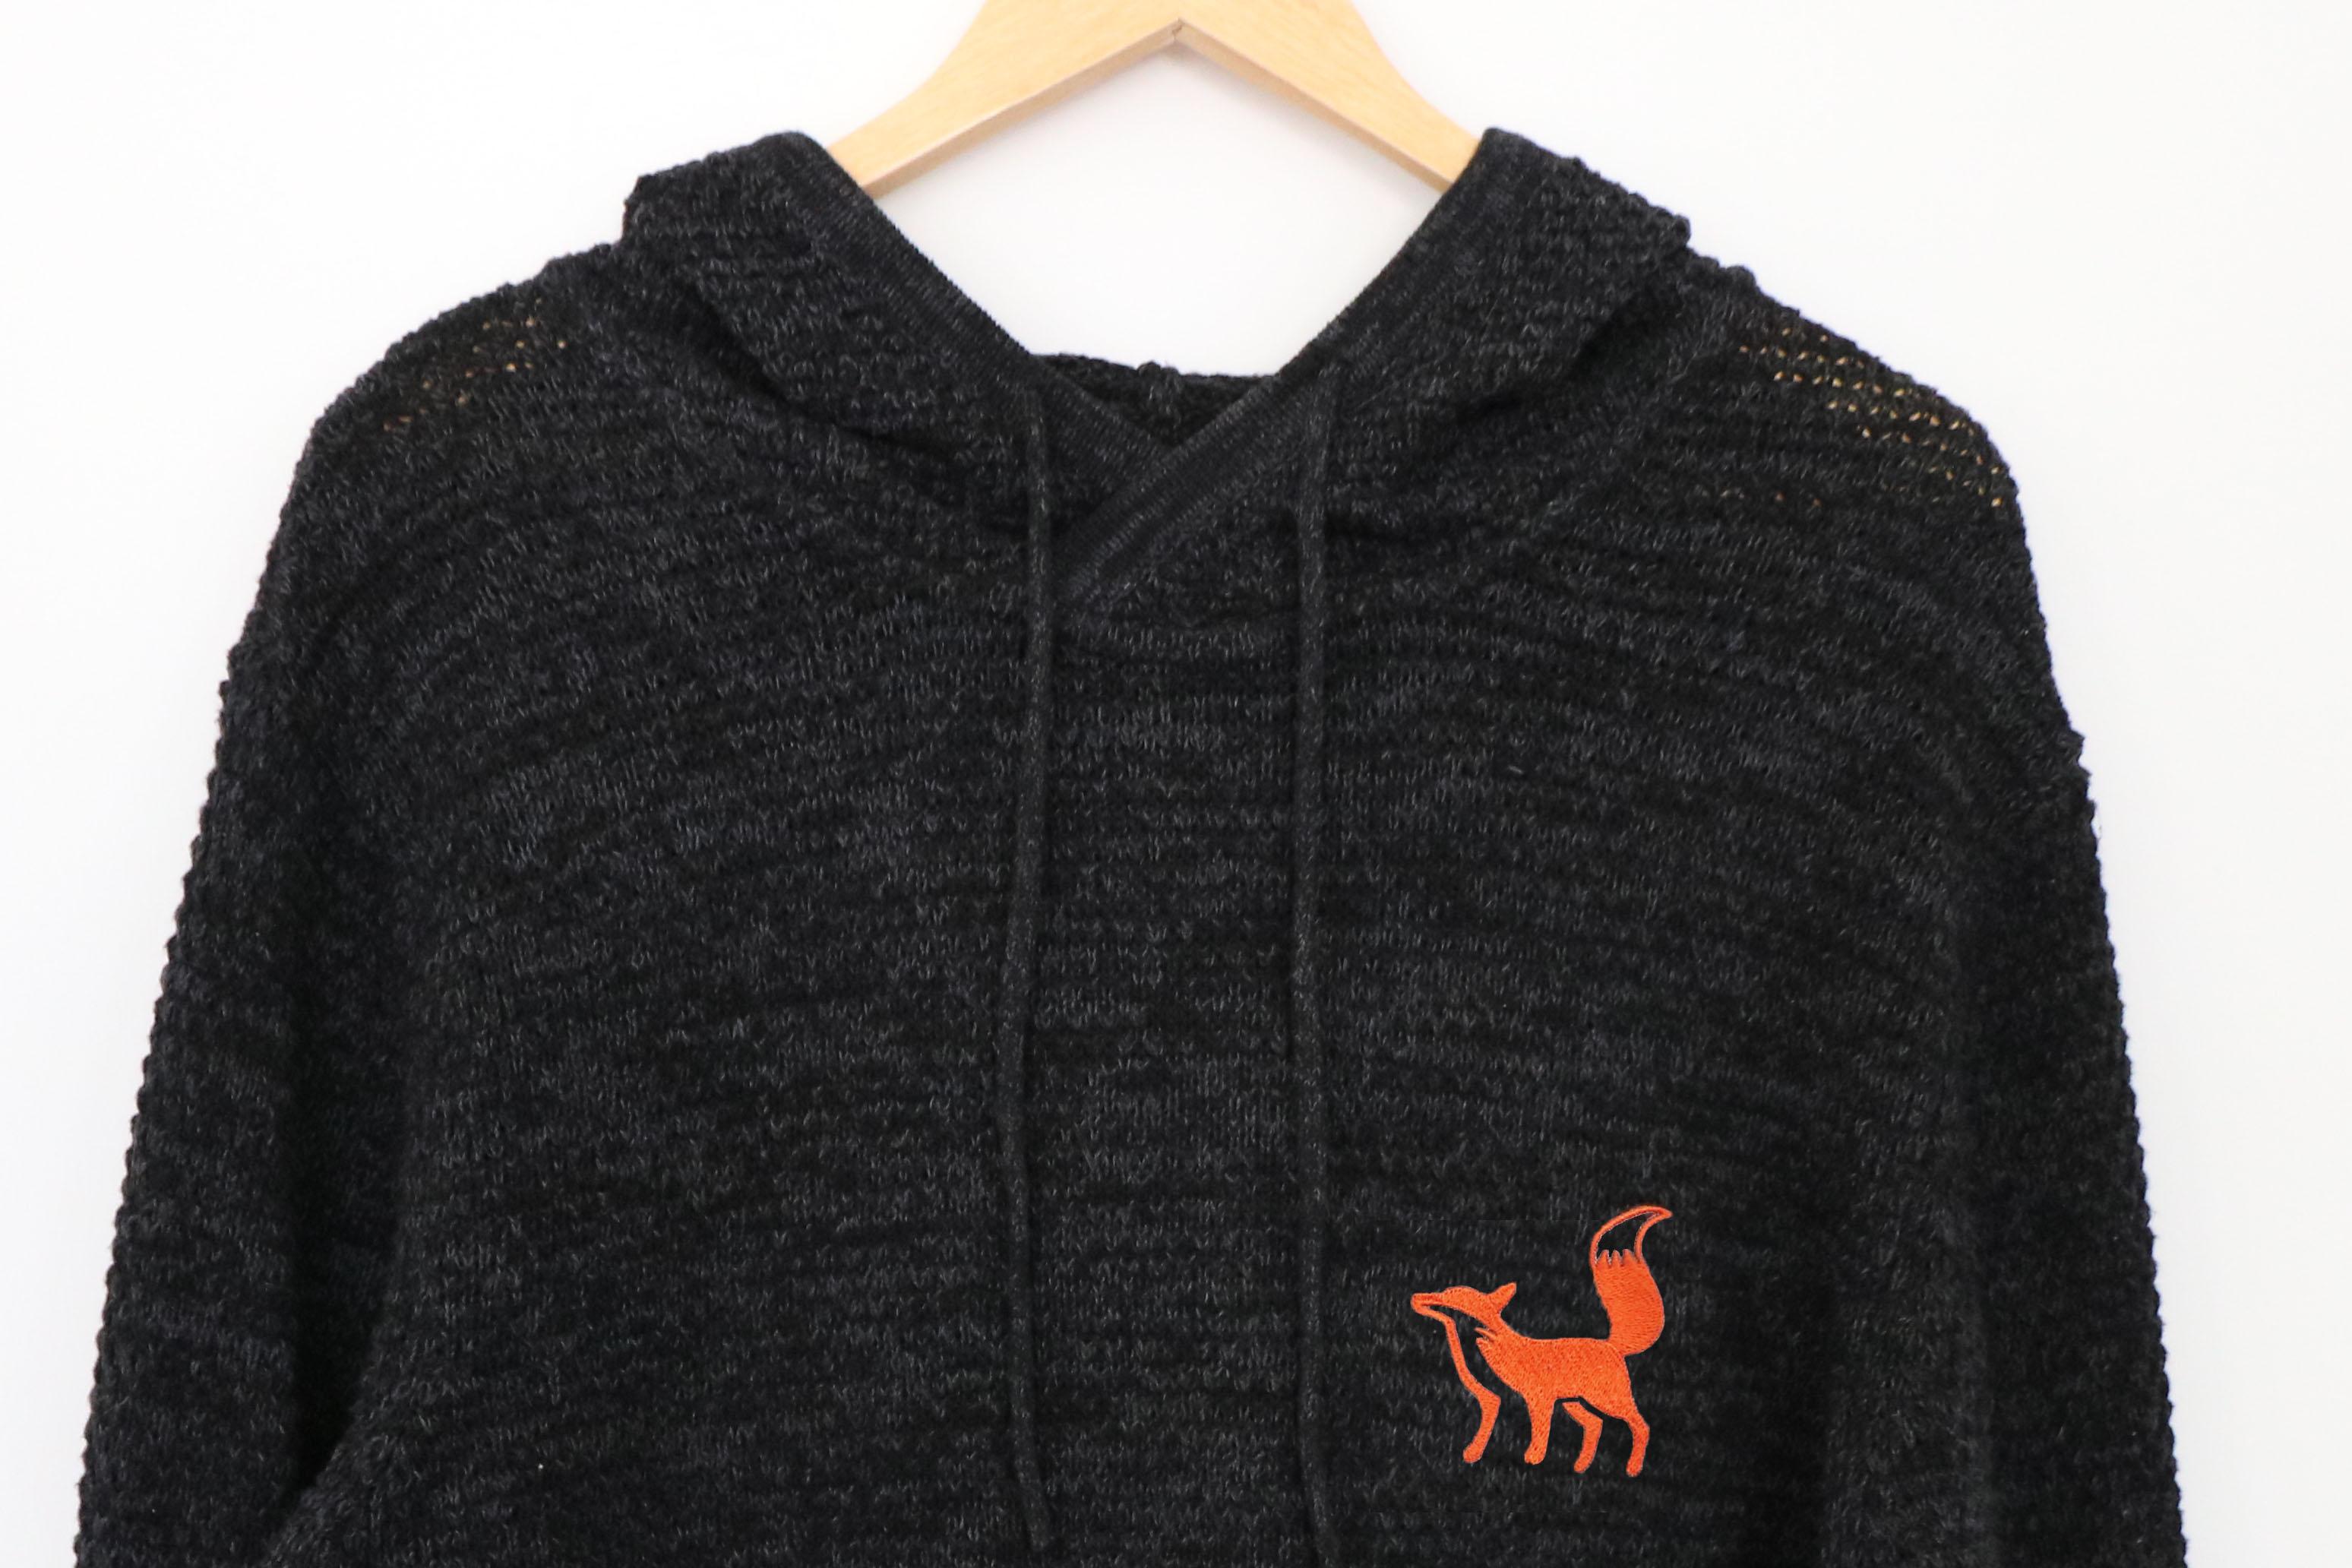 Fox Knit Oversize Hoodie